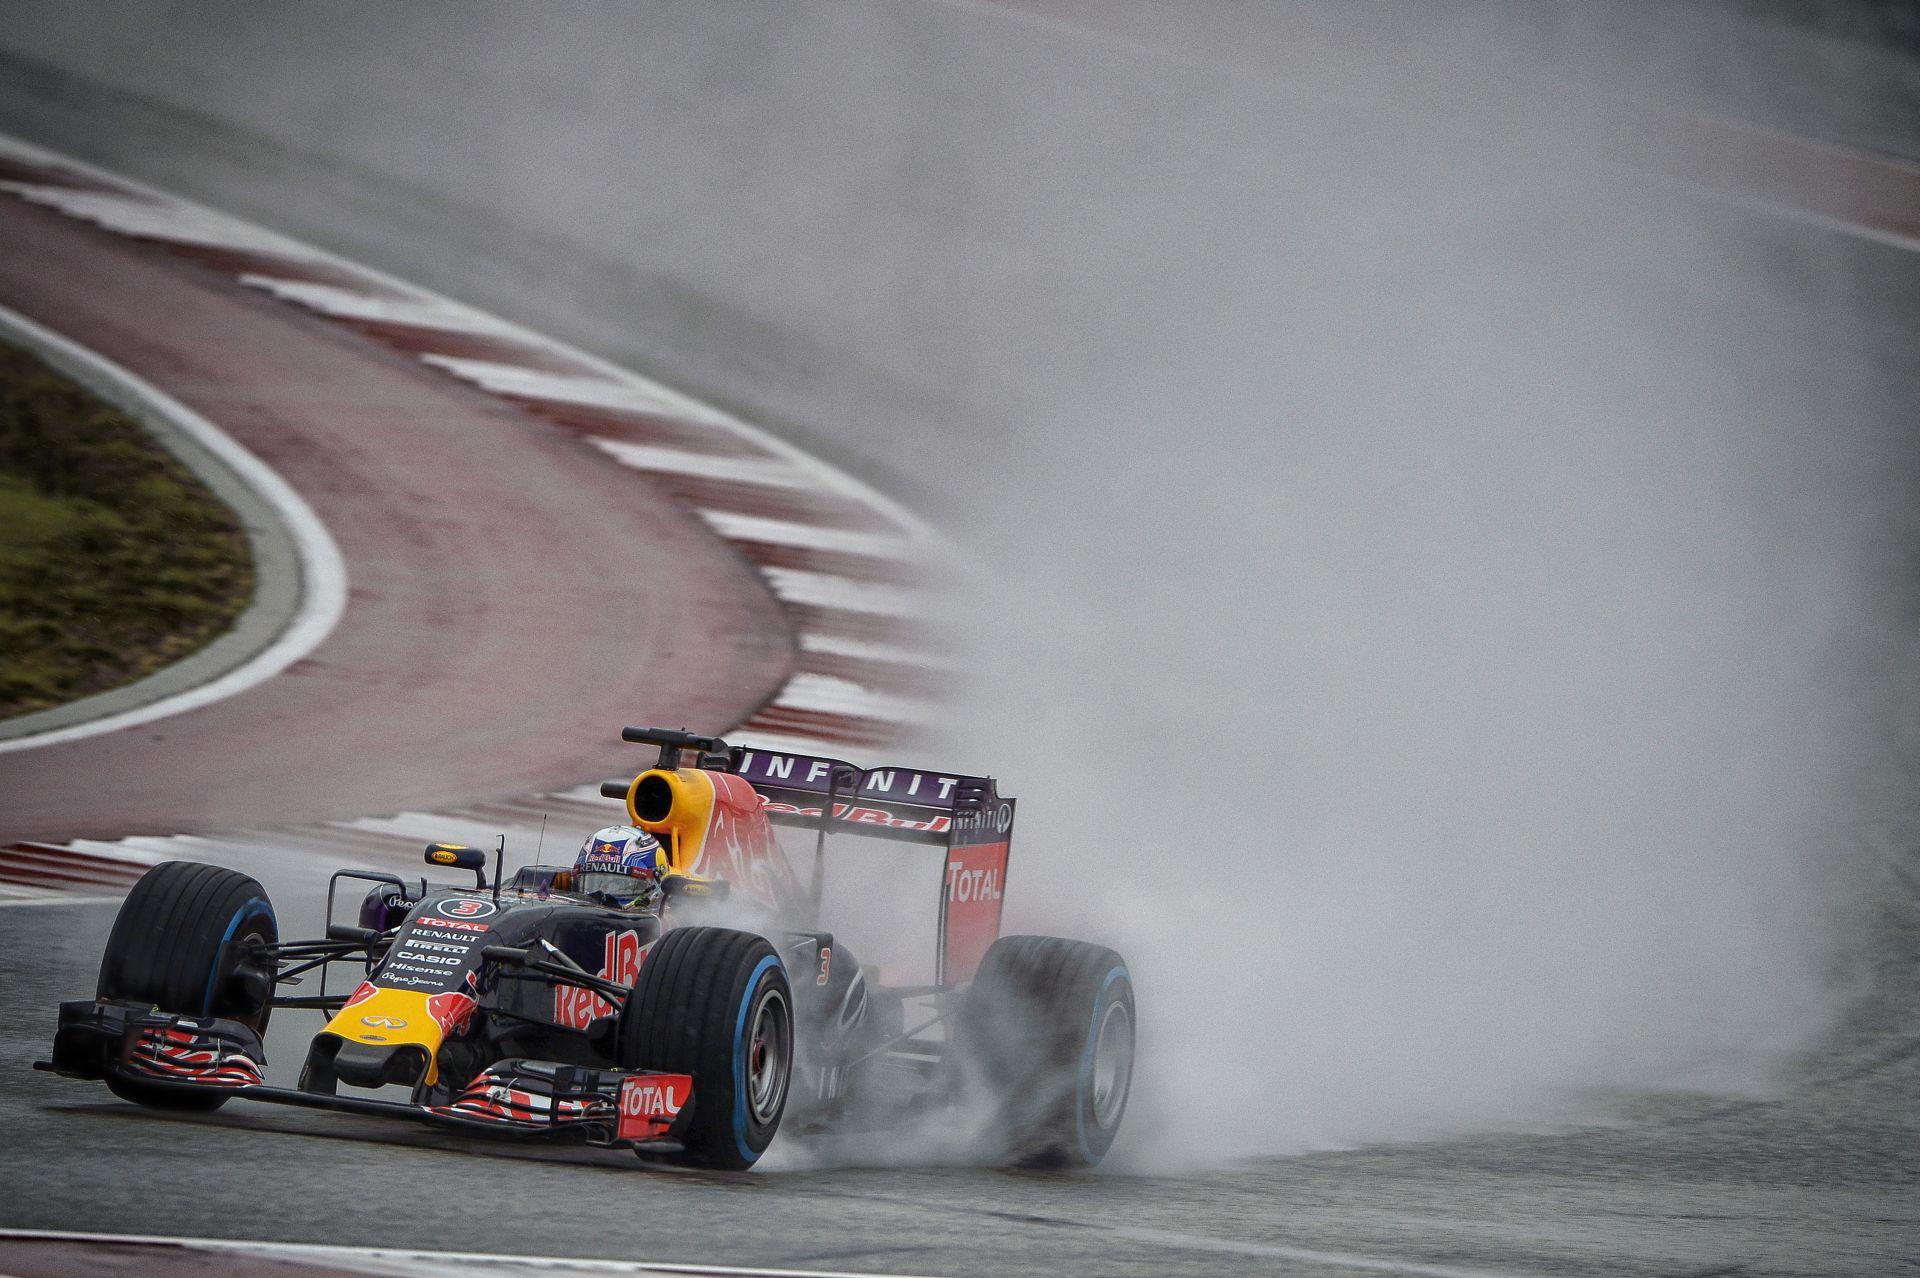 Hatalmas ziccert hagyott ma ki a Red Bull Austiban